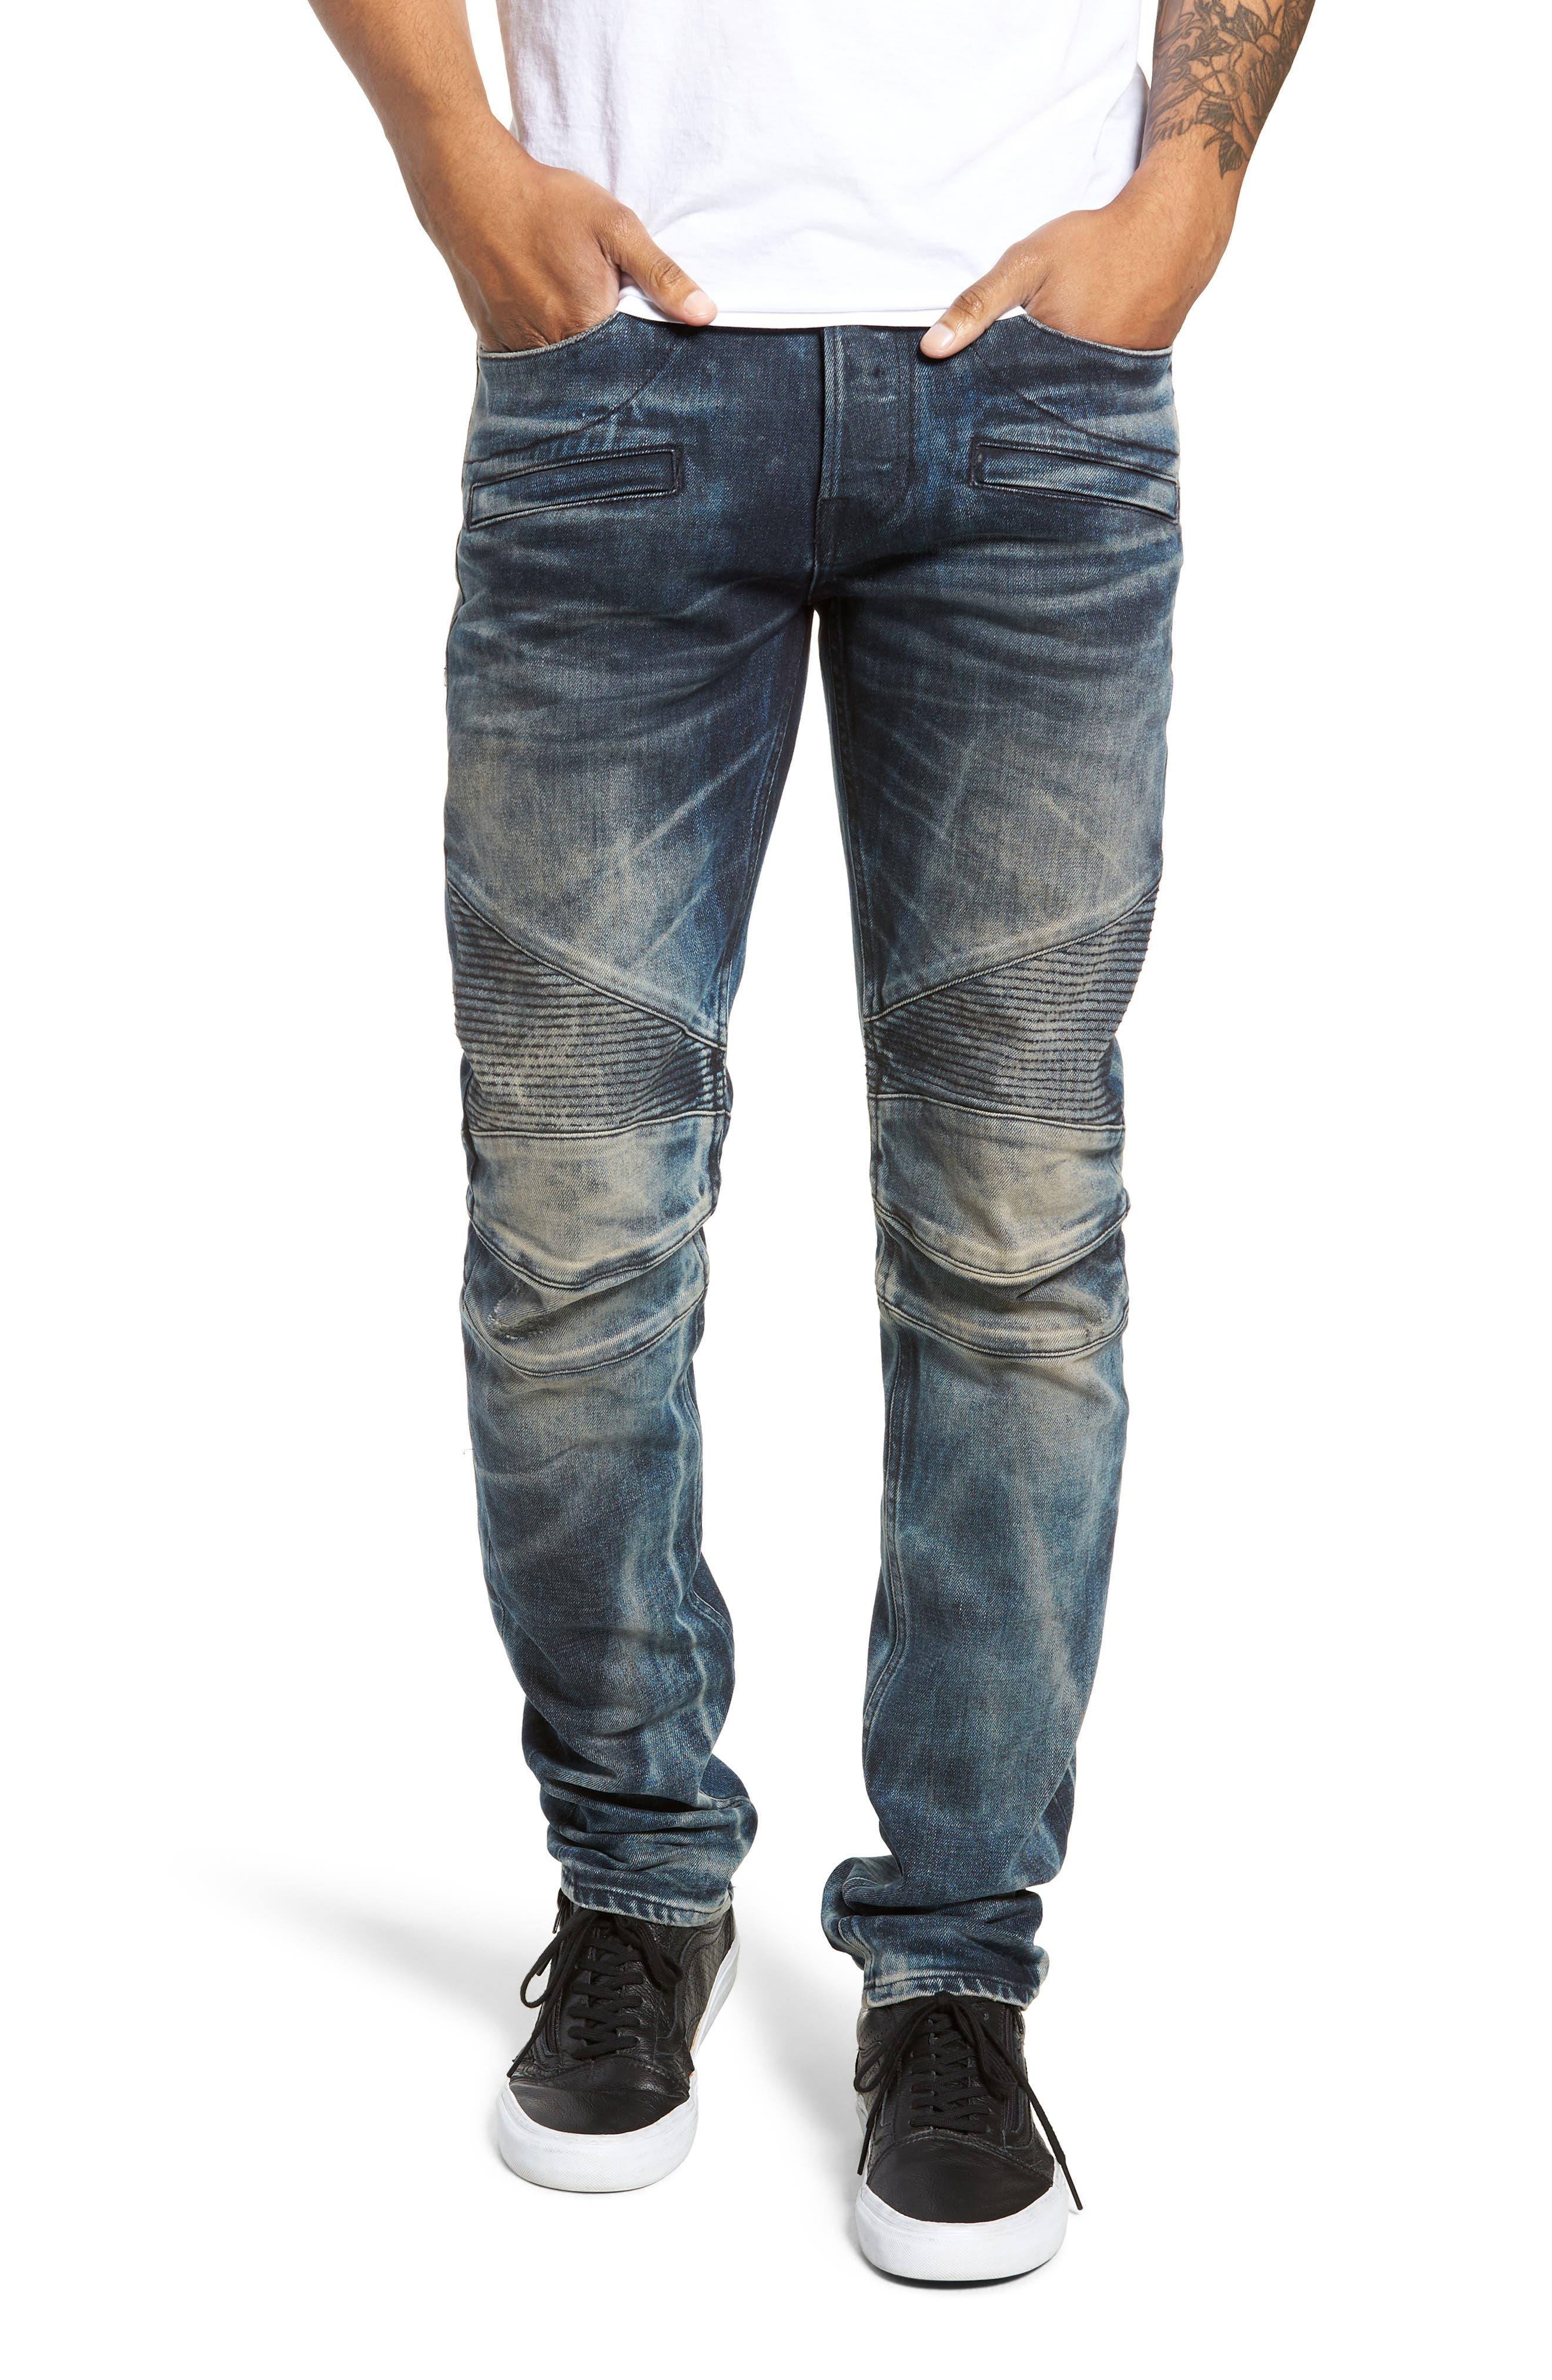 Blinder Biker Skinny Fit Jeans,                             Main thumbnail 1, color,                             MARTINO